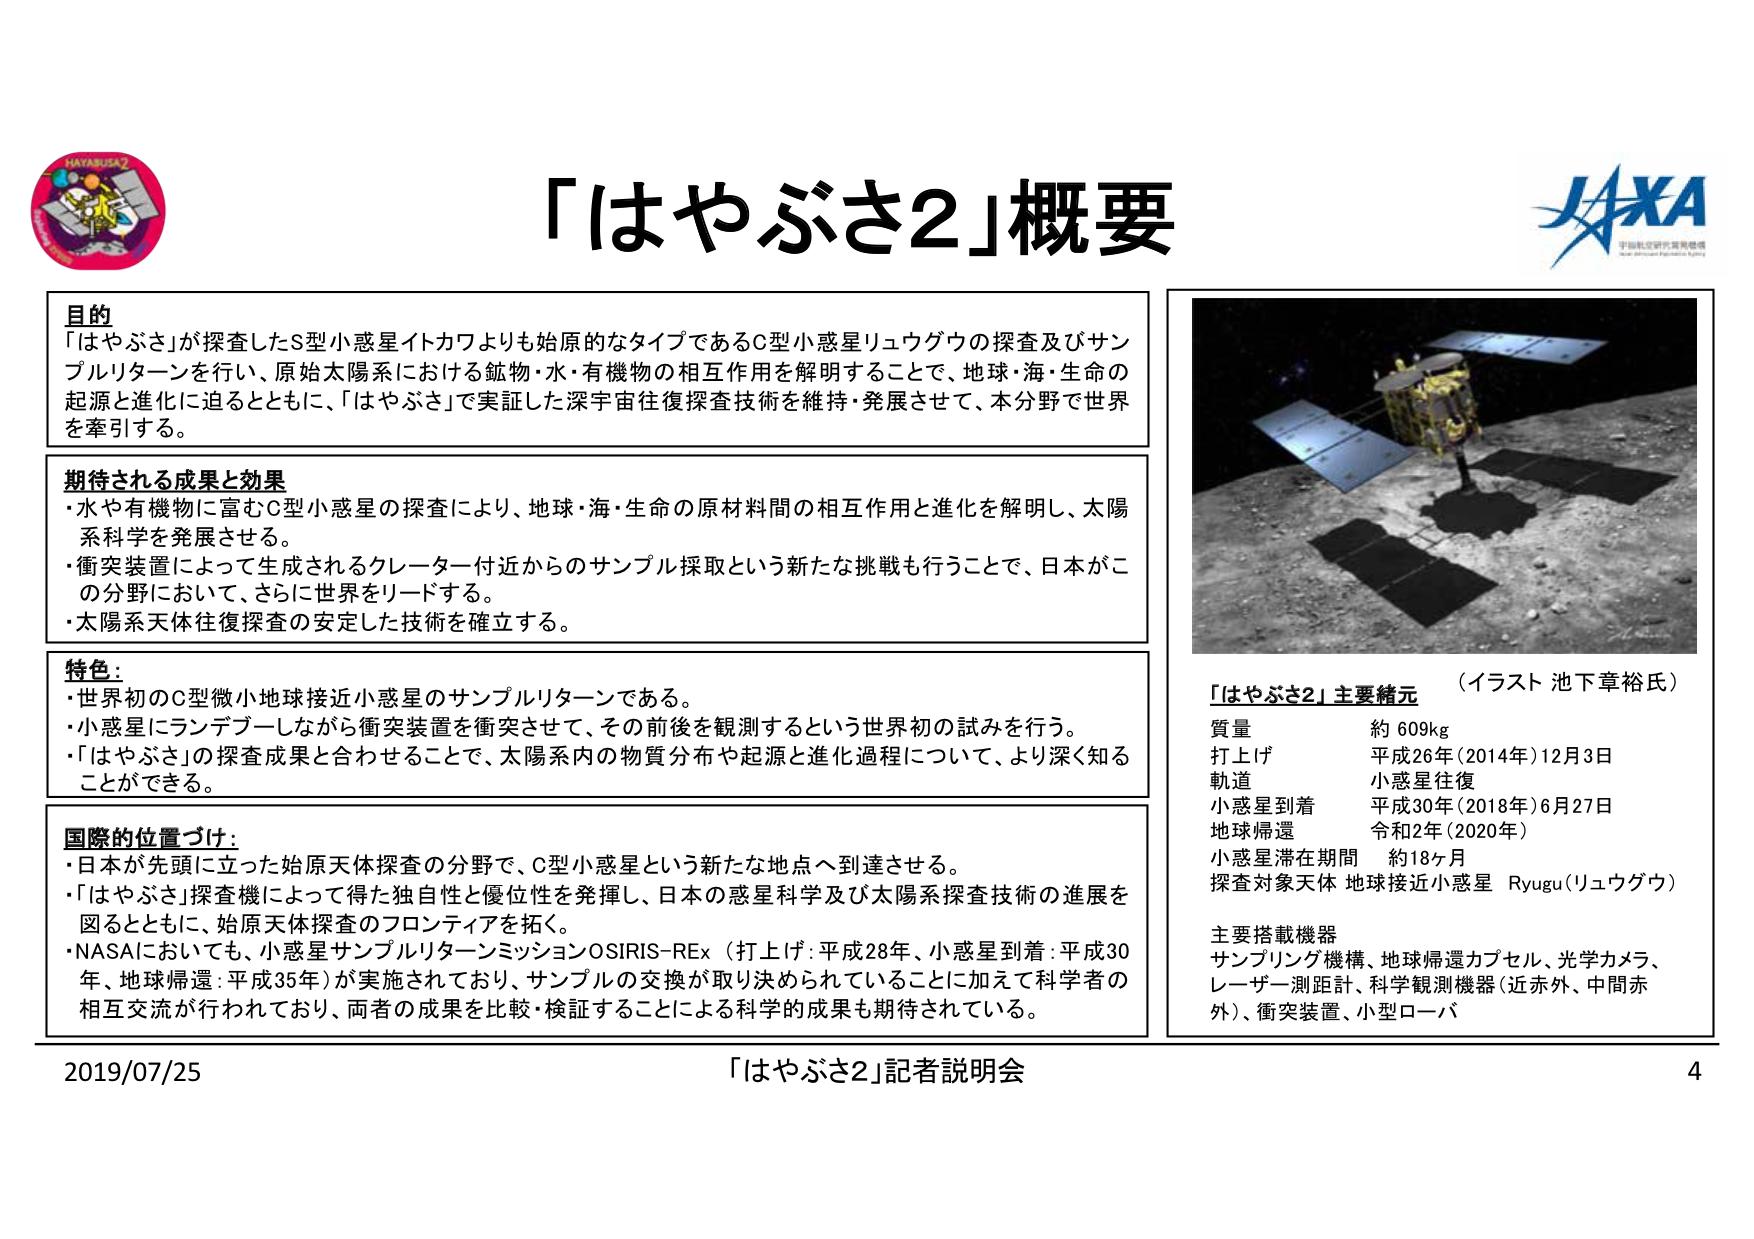 f:id:Imamura:20190725151052p:plain